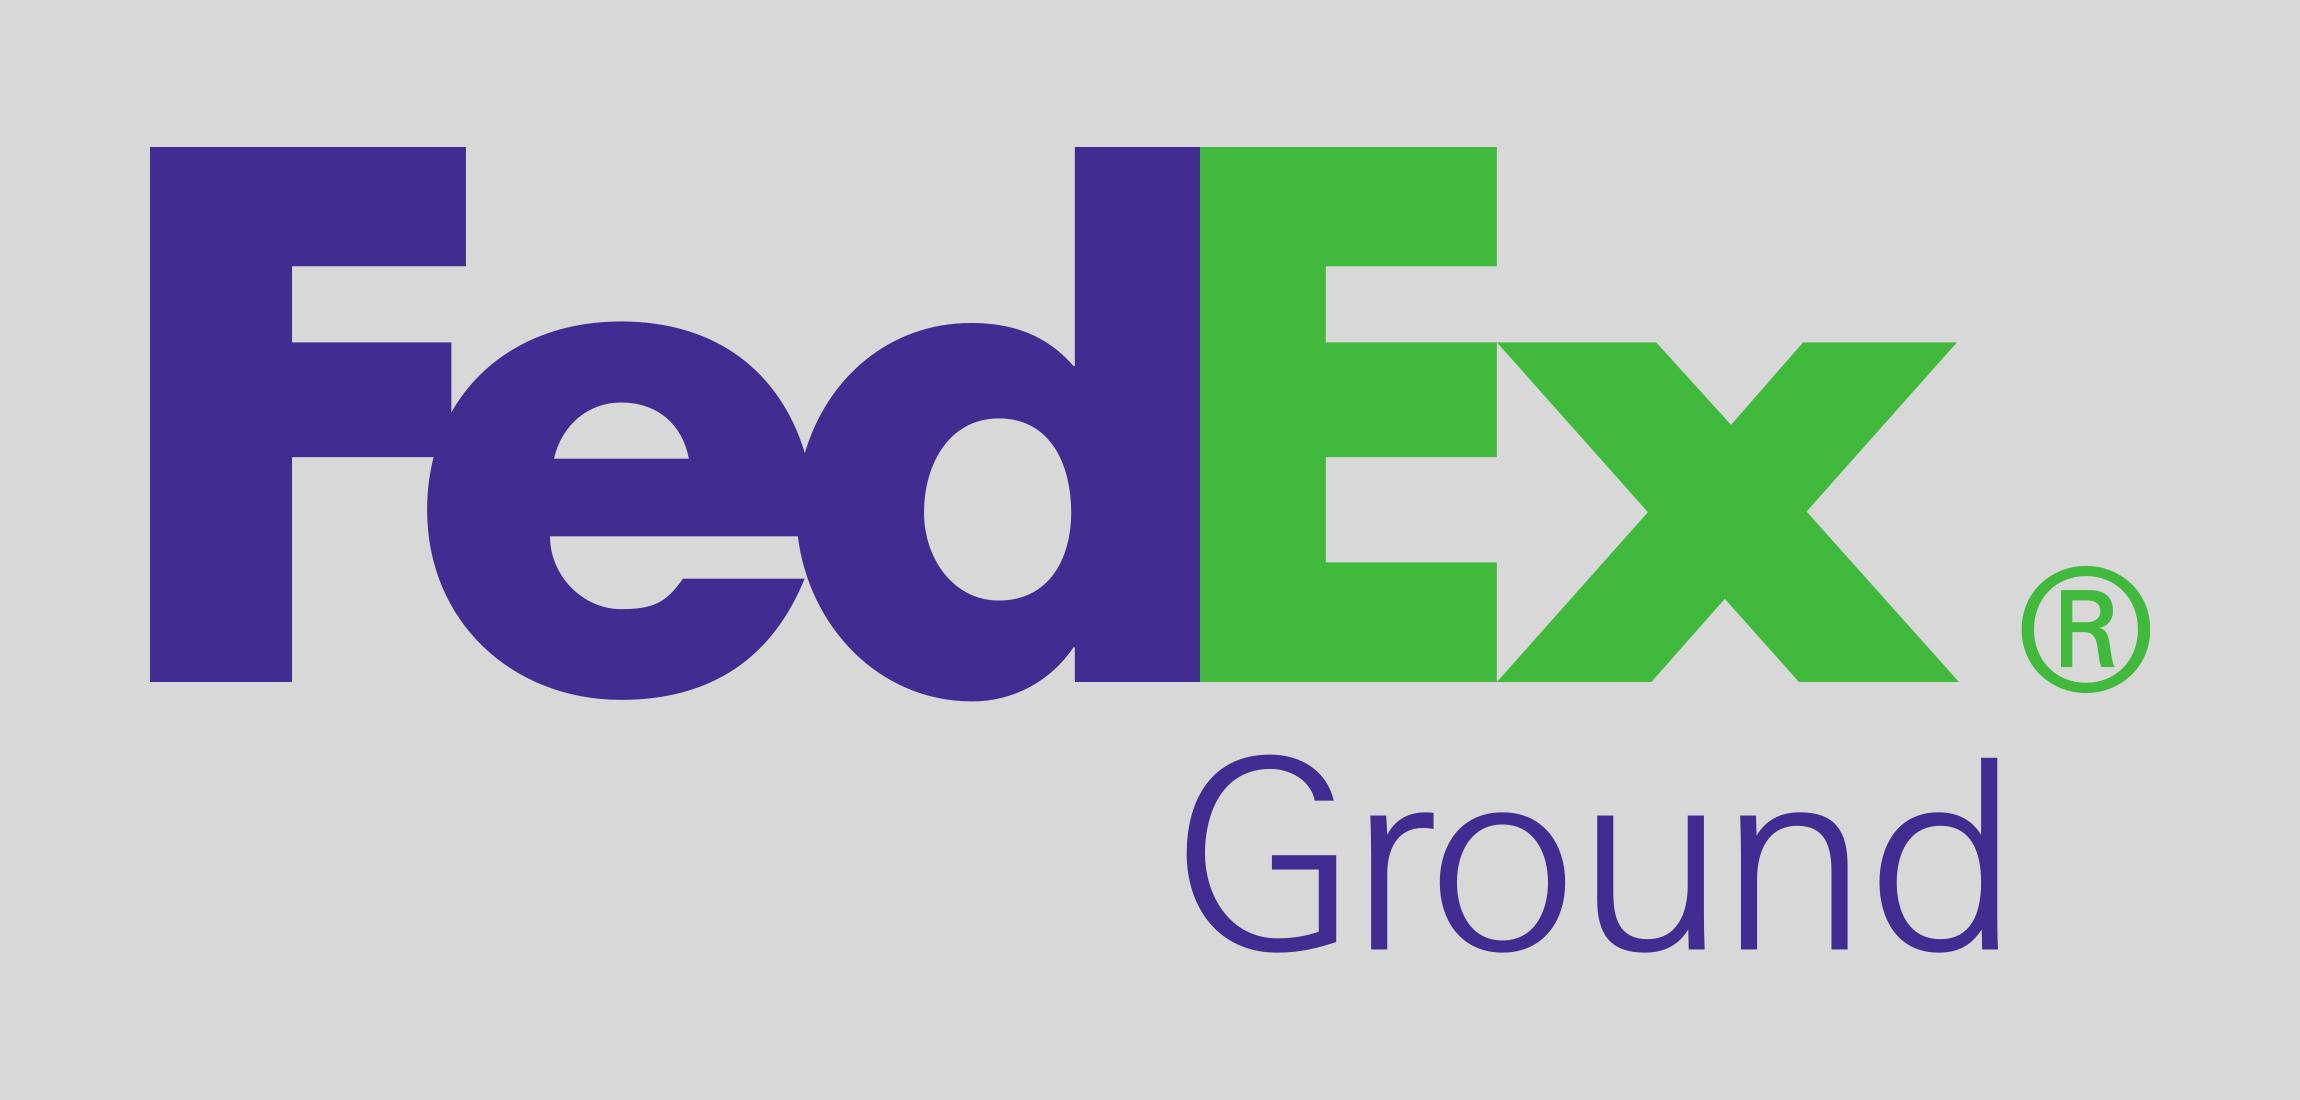 FedEx Logo, FedEx Symbol, Meaning, History and Evolution